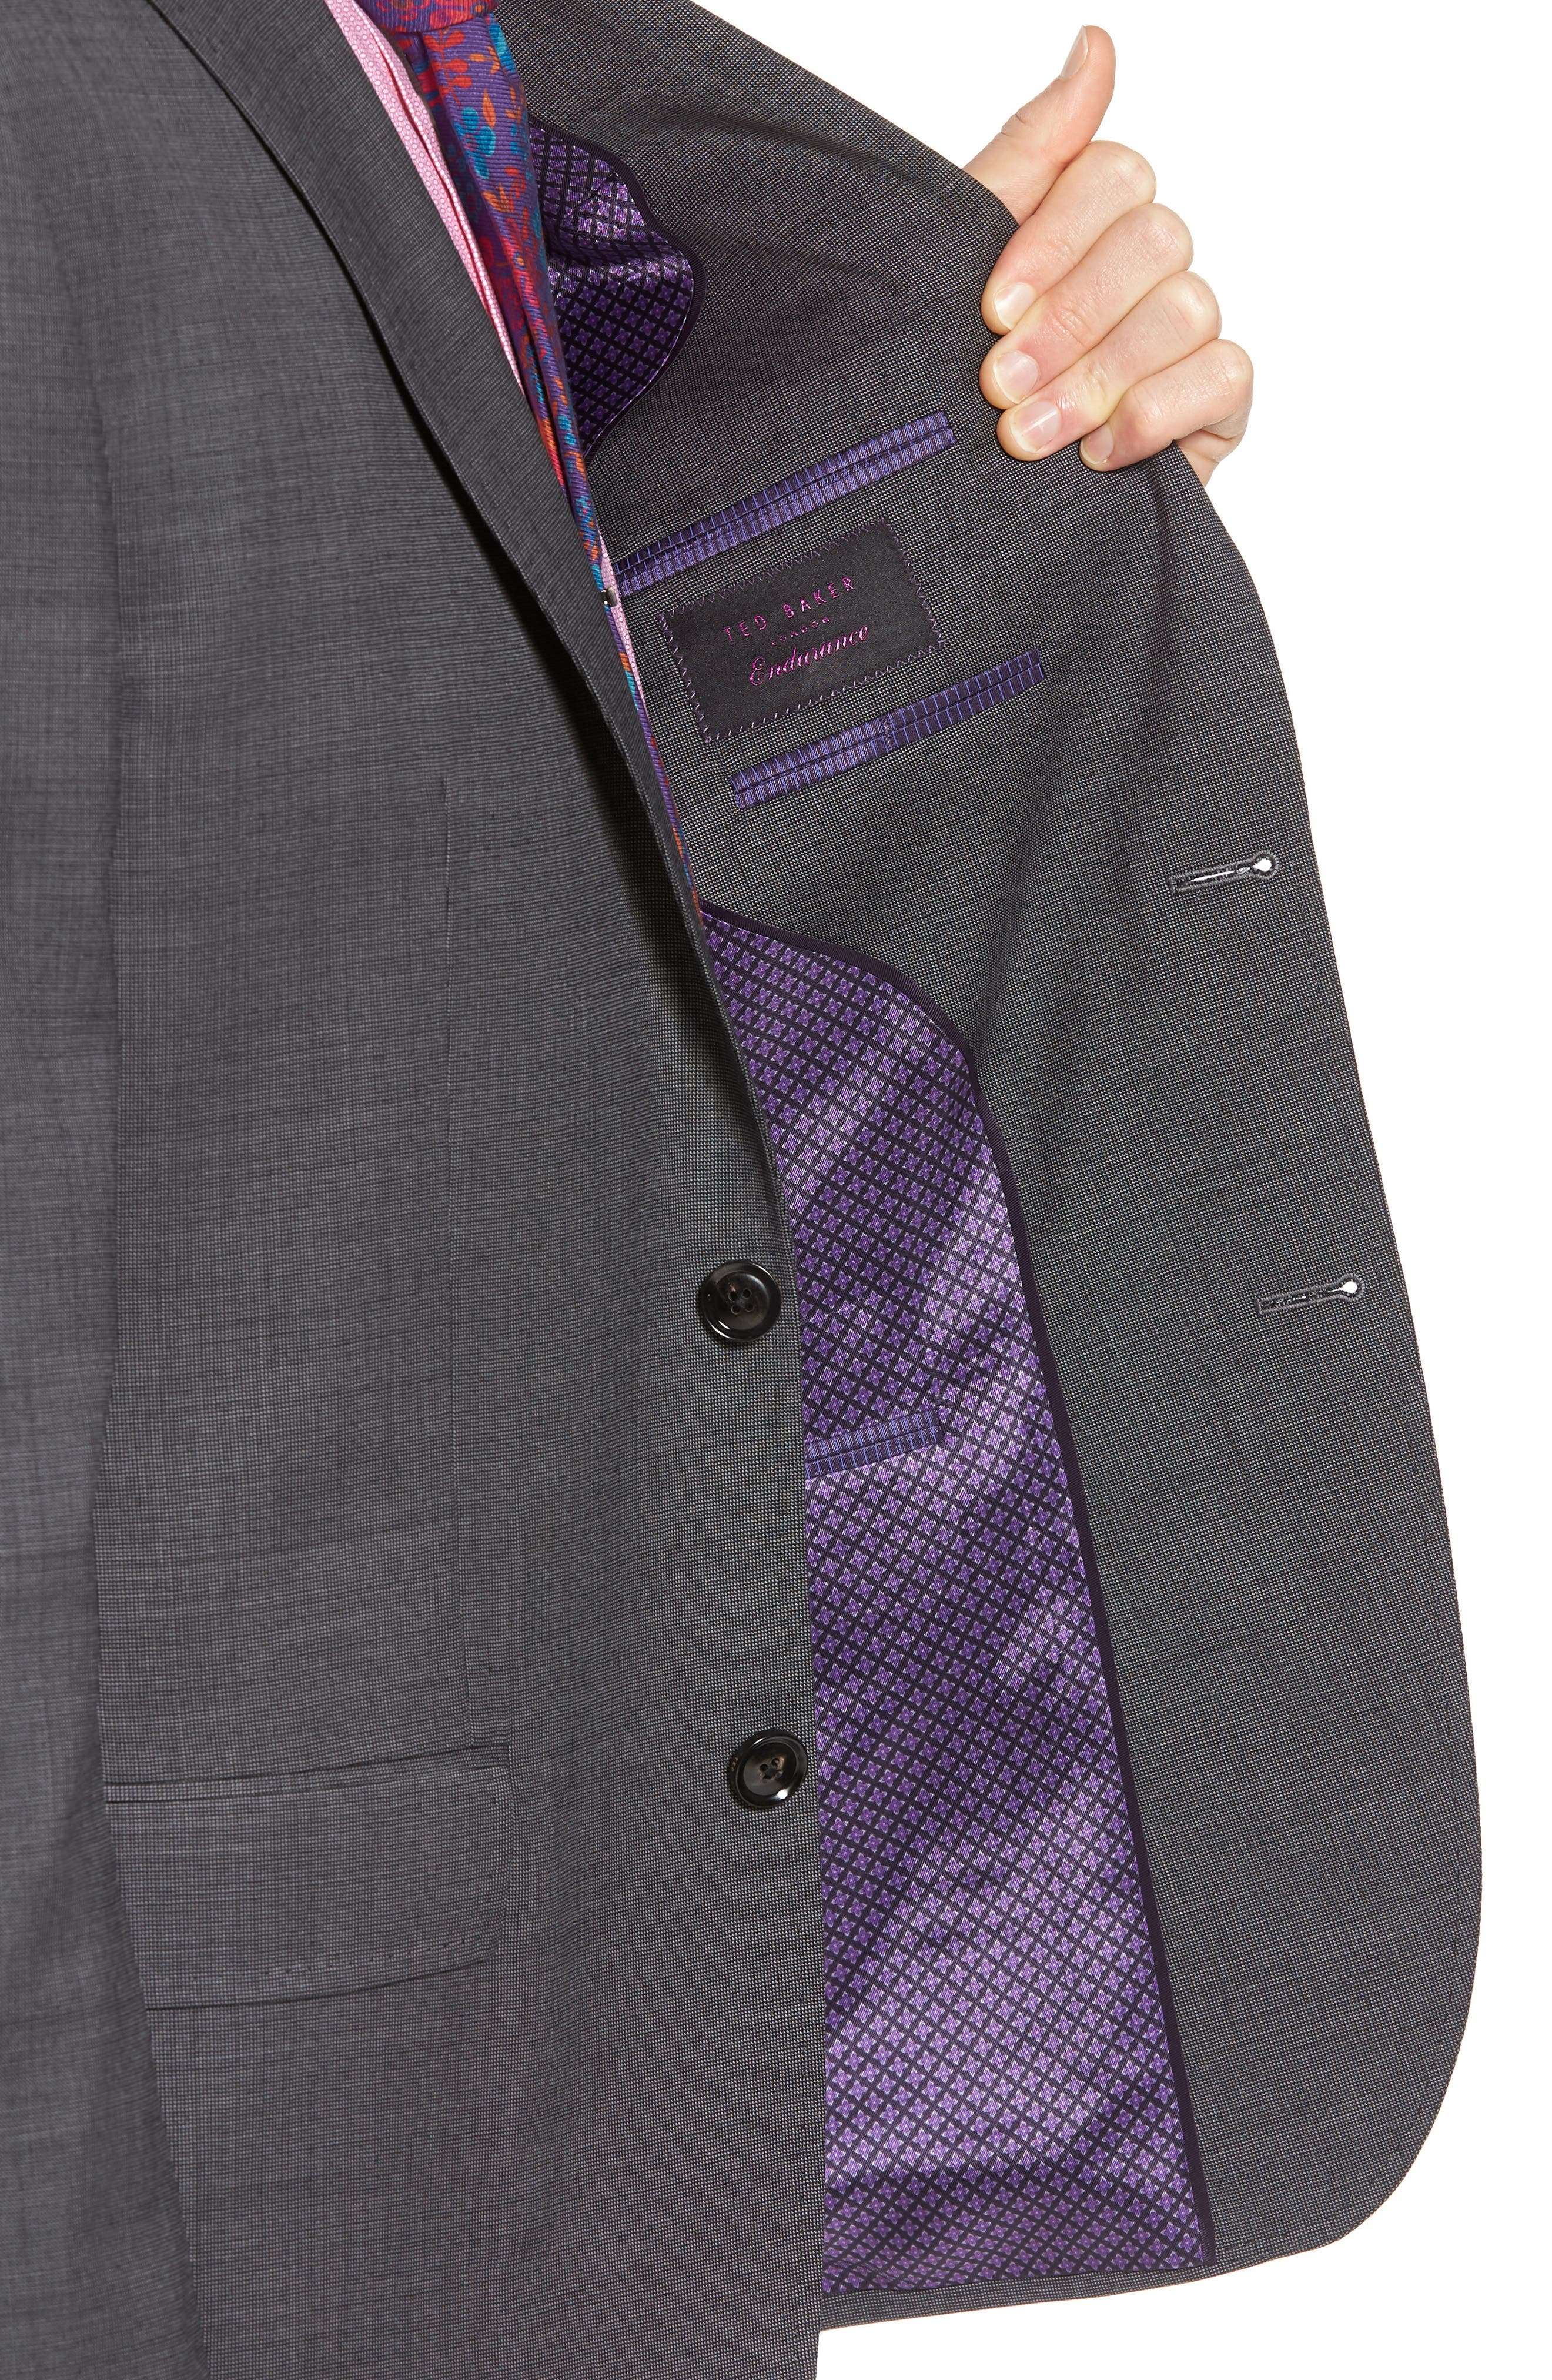 Jay Trim Fit Solid Wool Suit,                             Alternate thumbnail 4, color,                             020